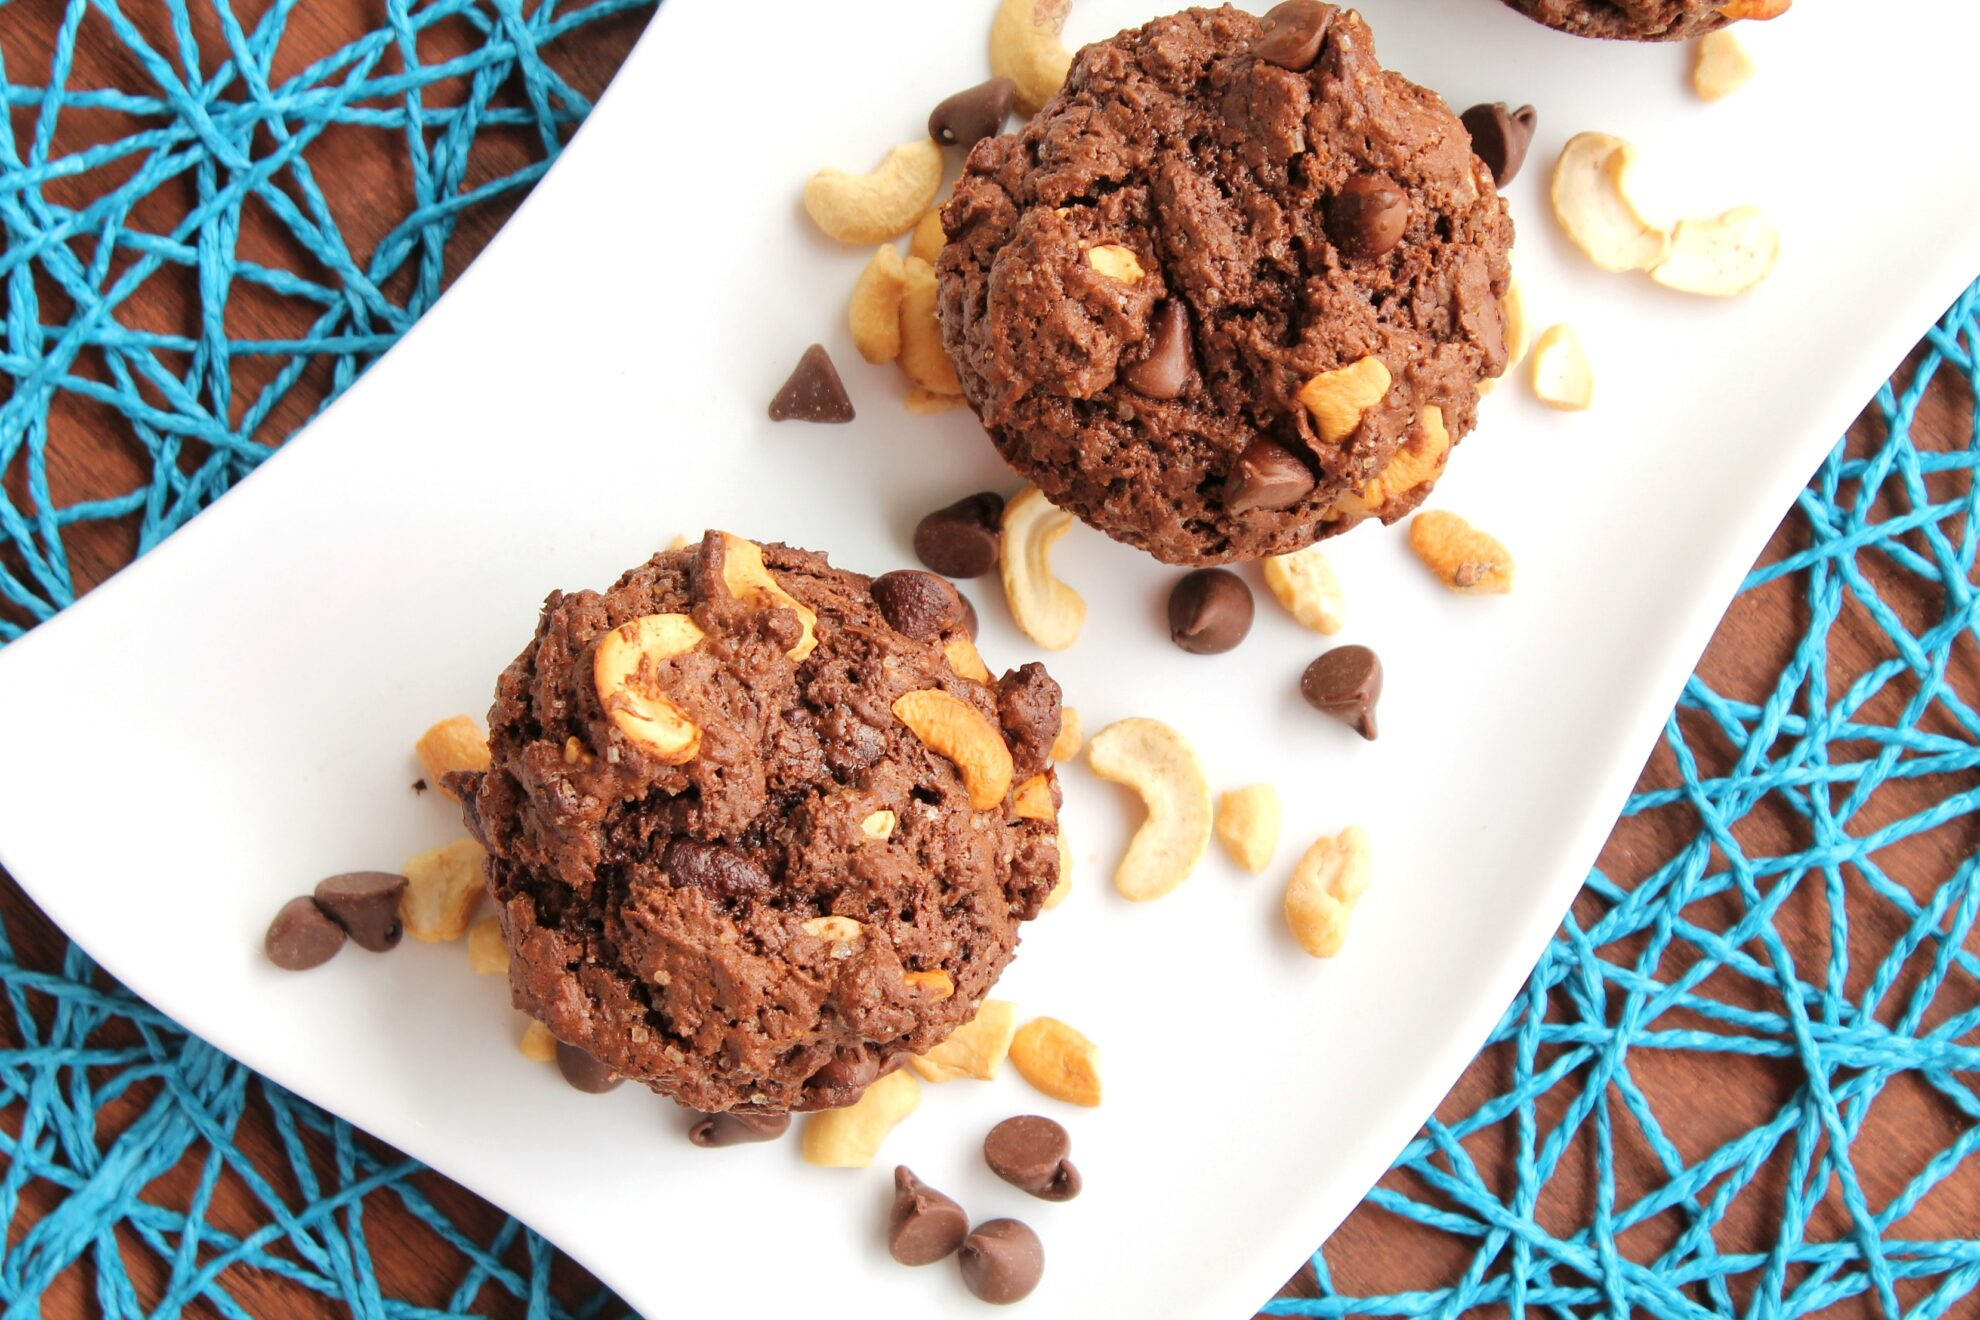 Chocolate Chip Cashew Muffins from 5DollarDinners.com